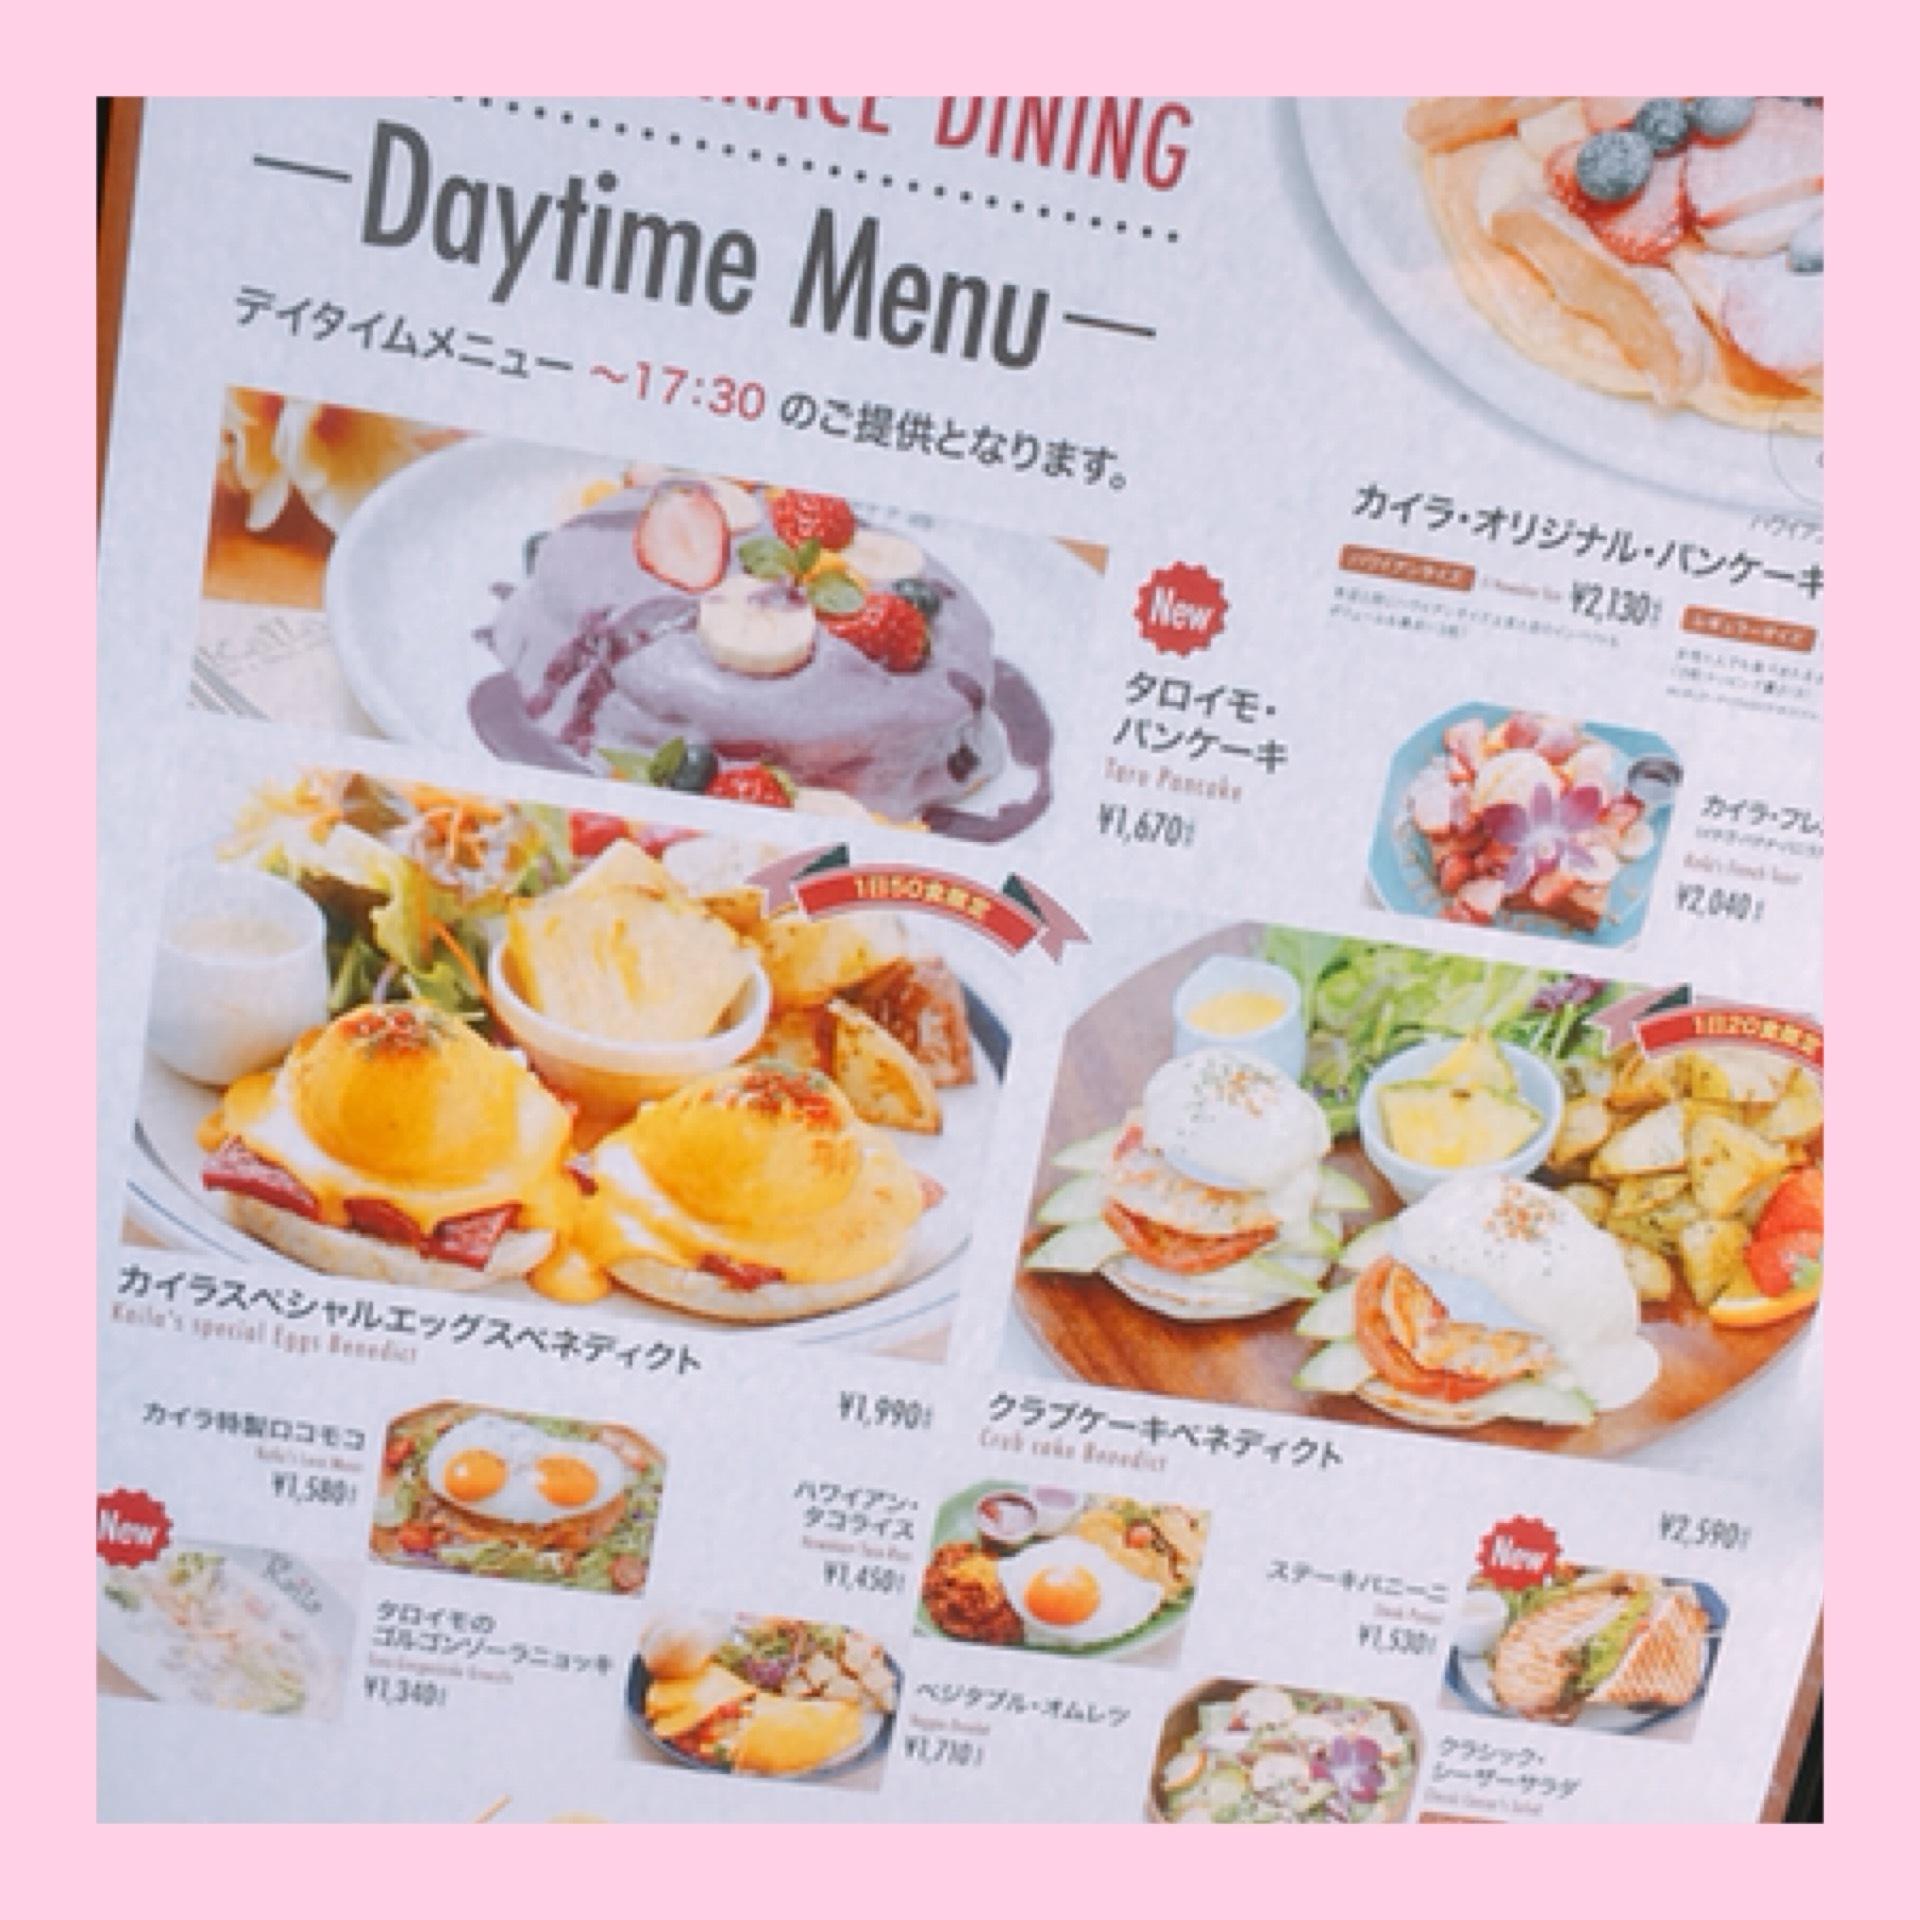 《Kaila Café & Terrace Dining Shibuya》オリジナルパンケーキ♫♡_1_3